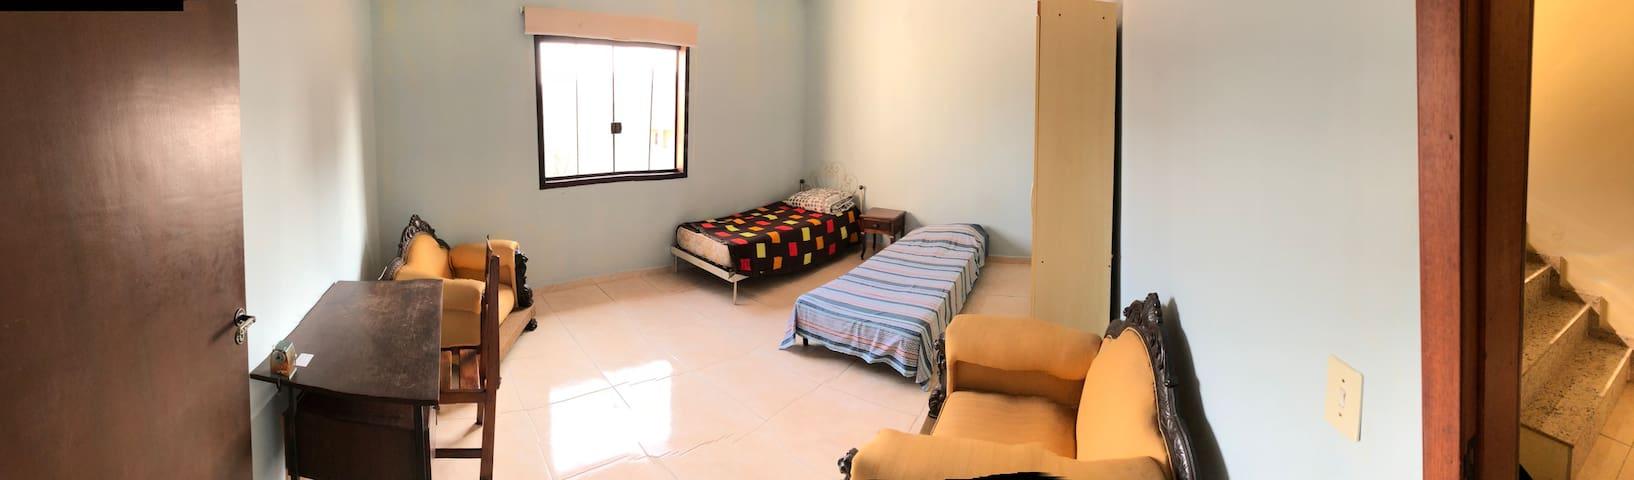 Nice room in Santo André, São Paulo